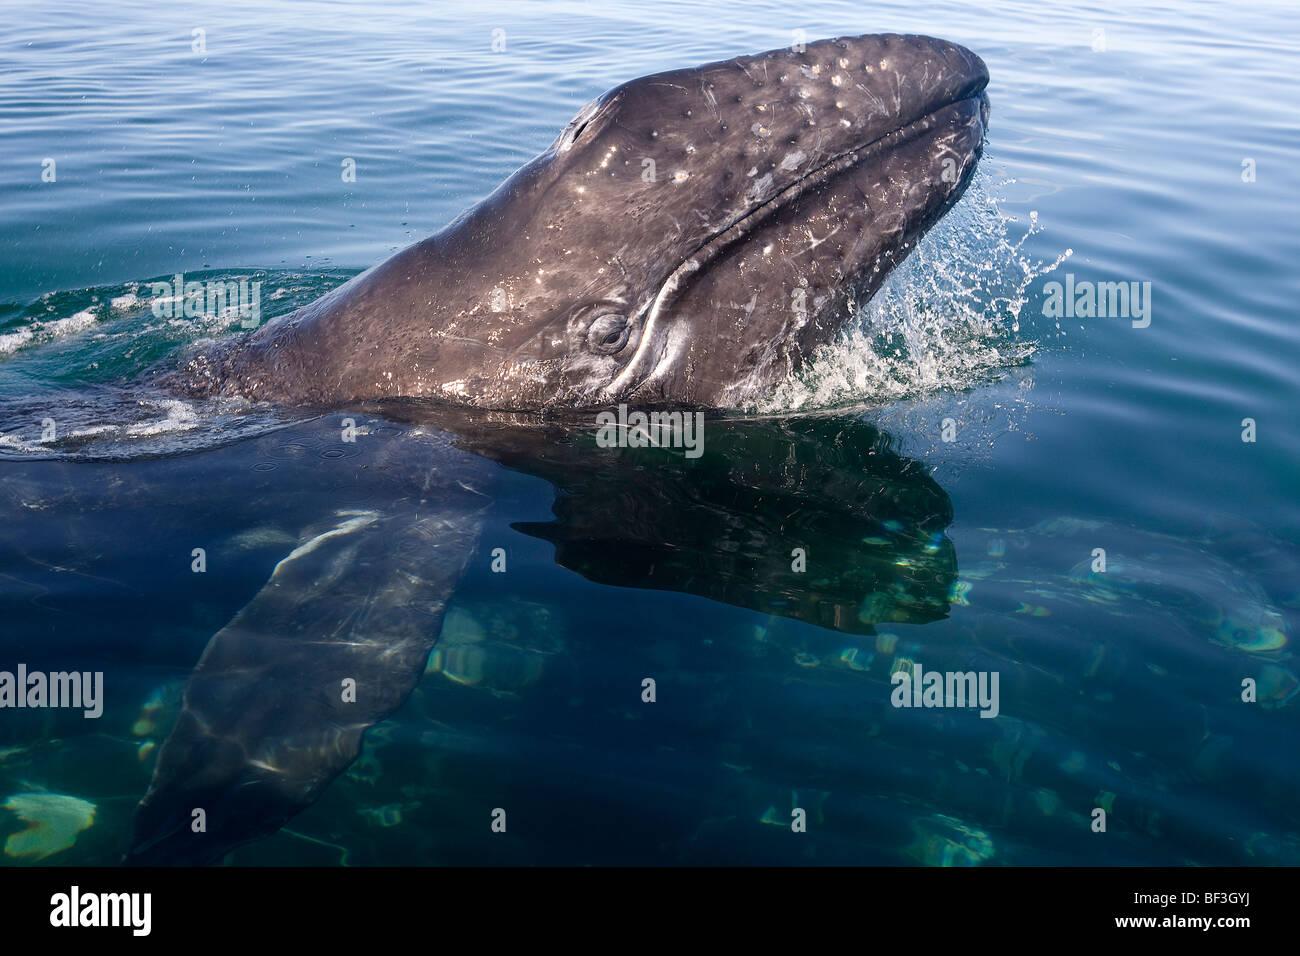 Gray Whale, Grey Whale (Eschrichtius robustus, Eschrichtius gibbosus). Calf with head raised above water. - Stock Image